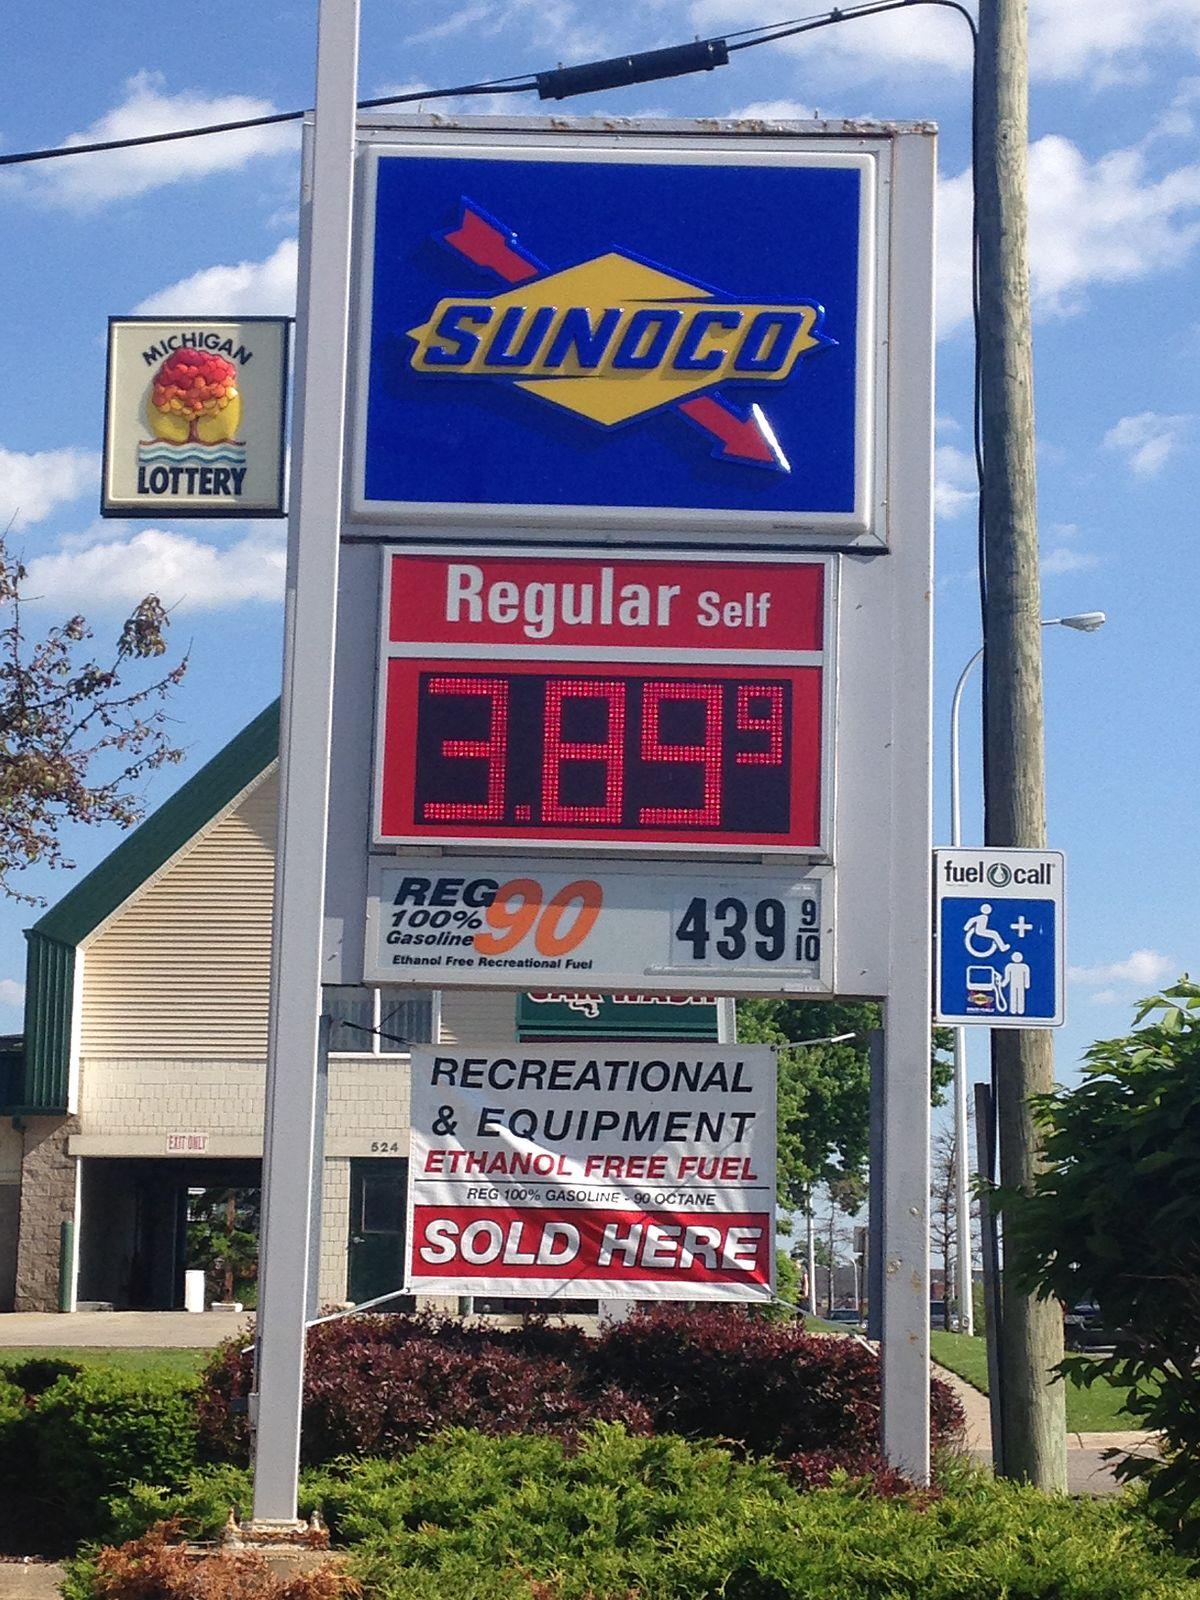 E85 Gas Stations >> REC-90 - Wikipedia